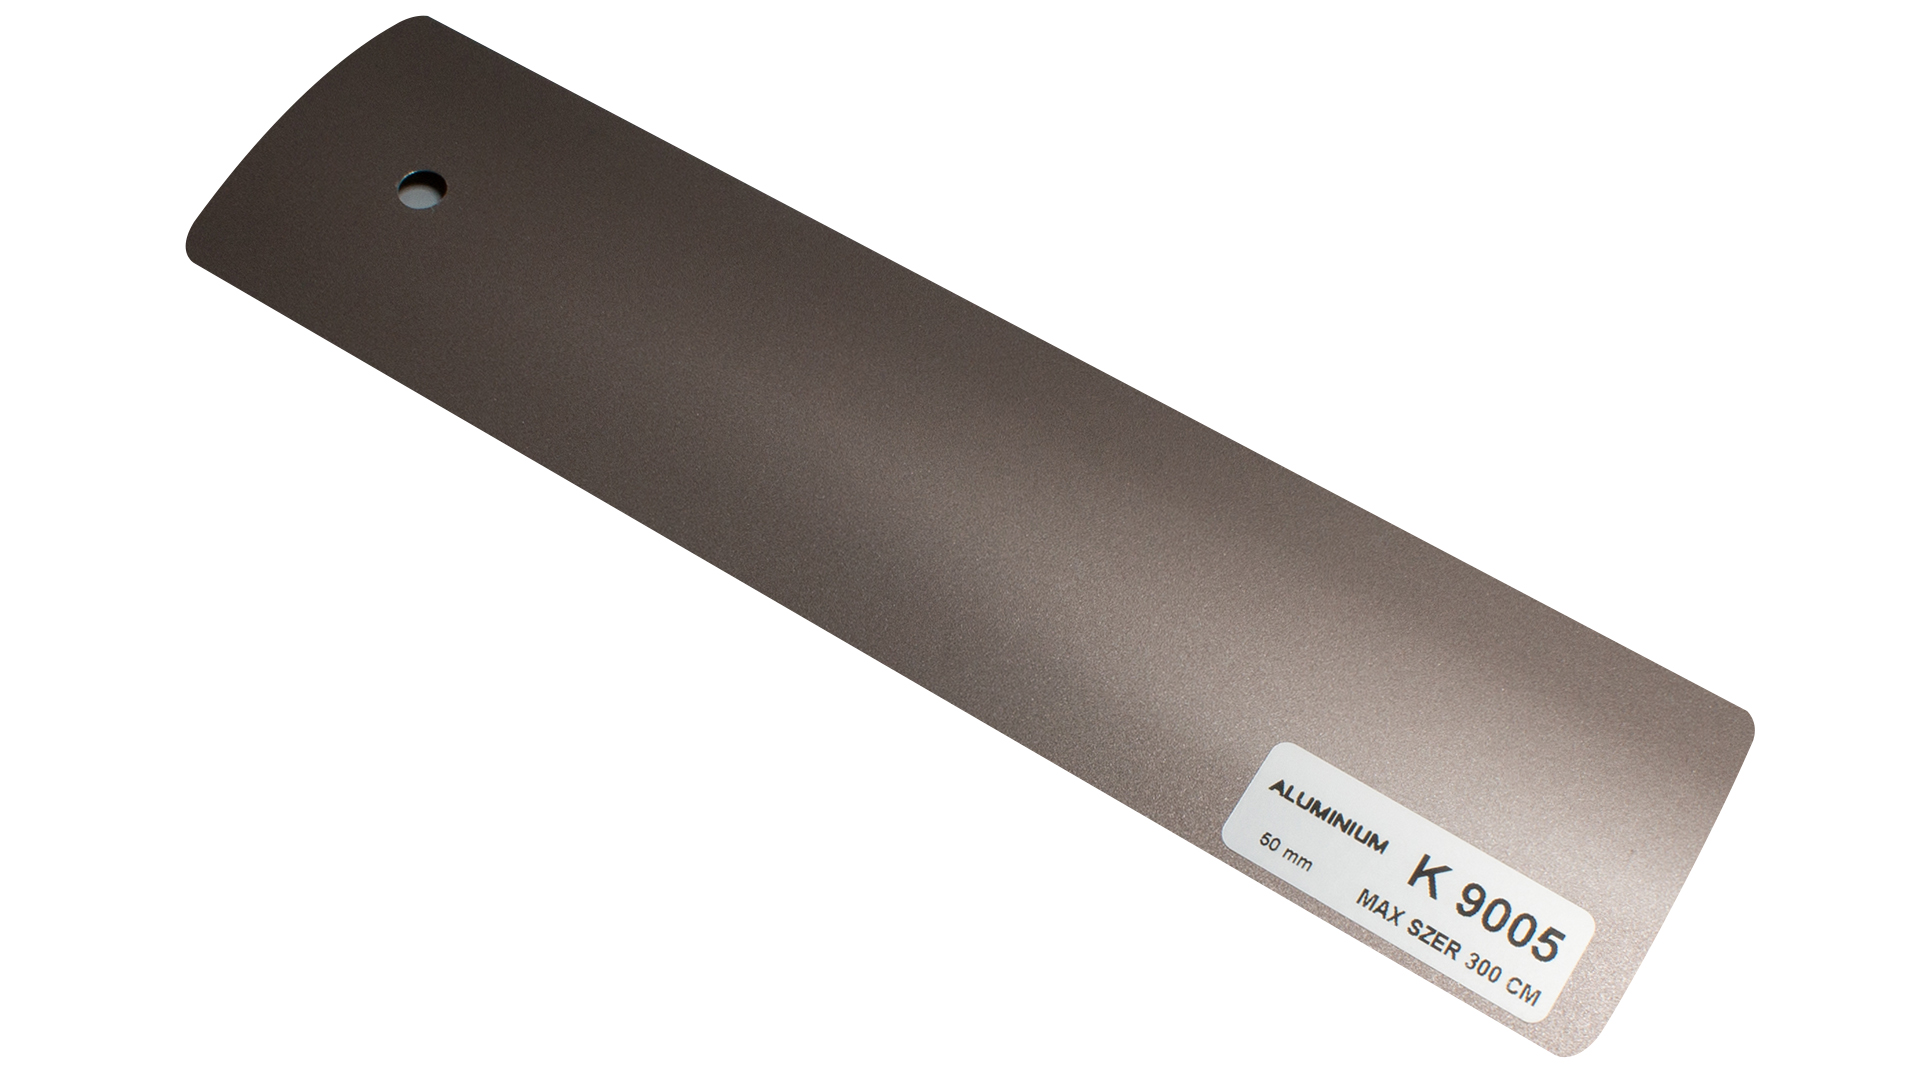 K9005